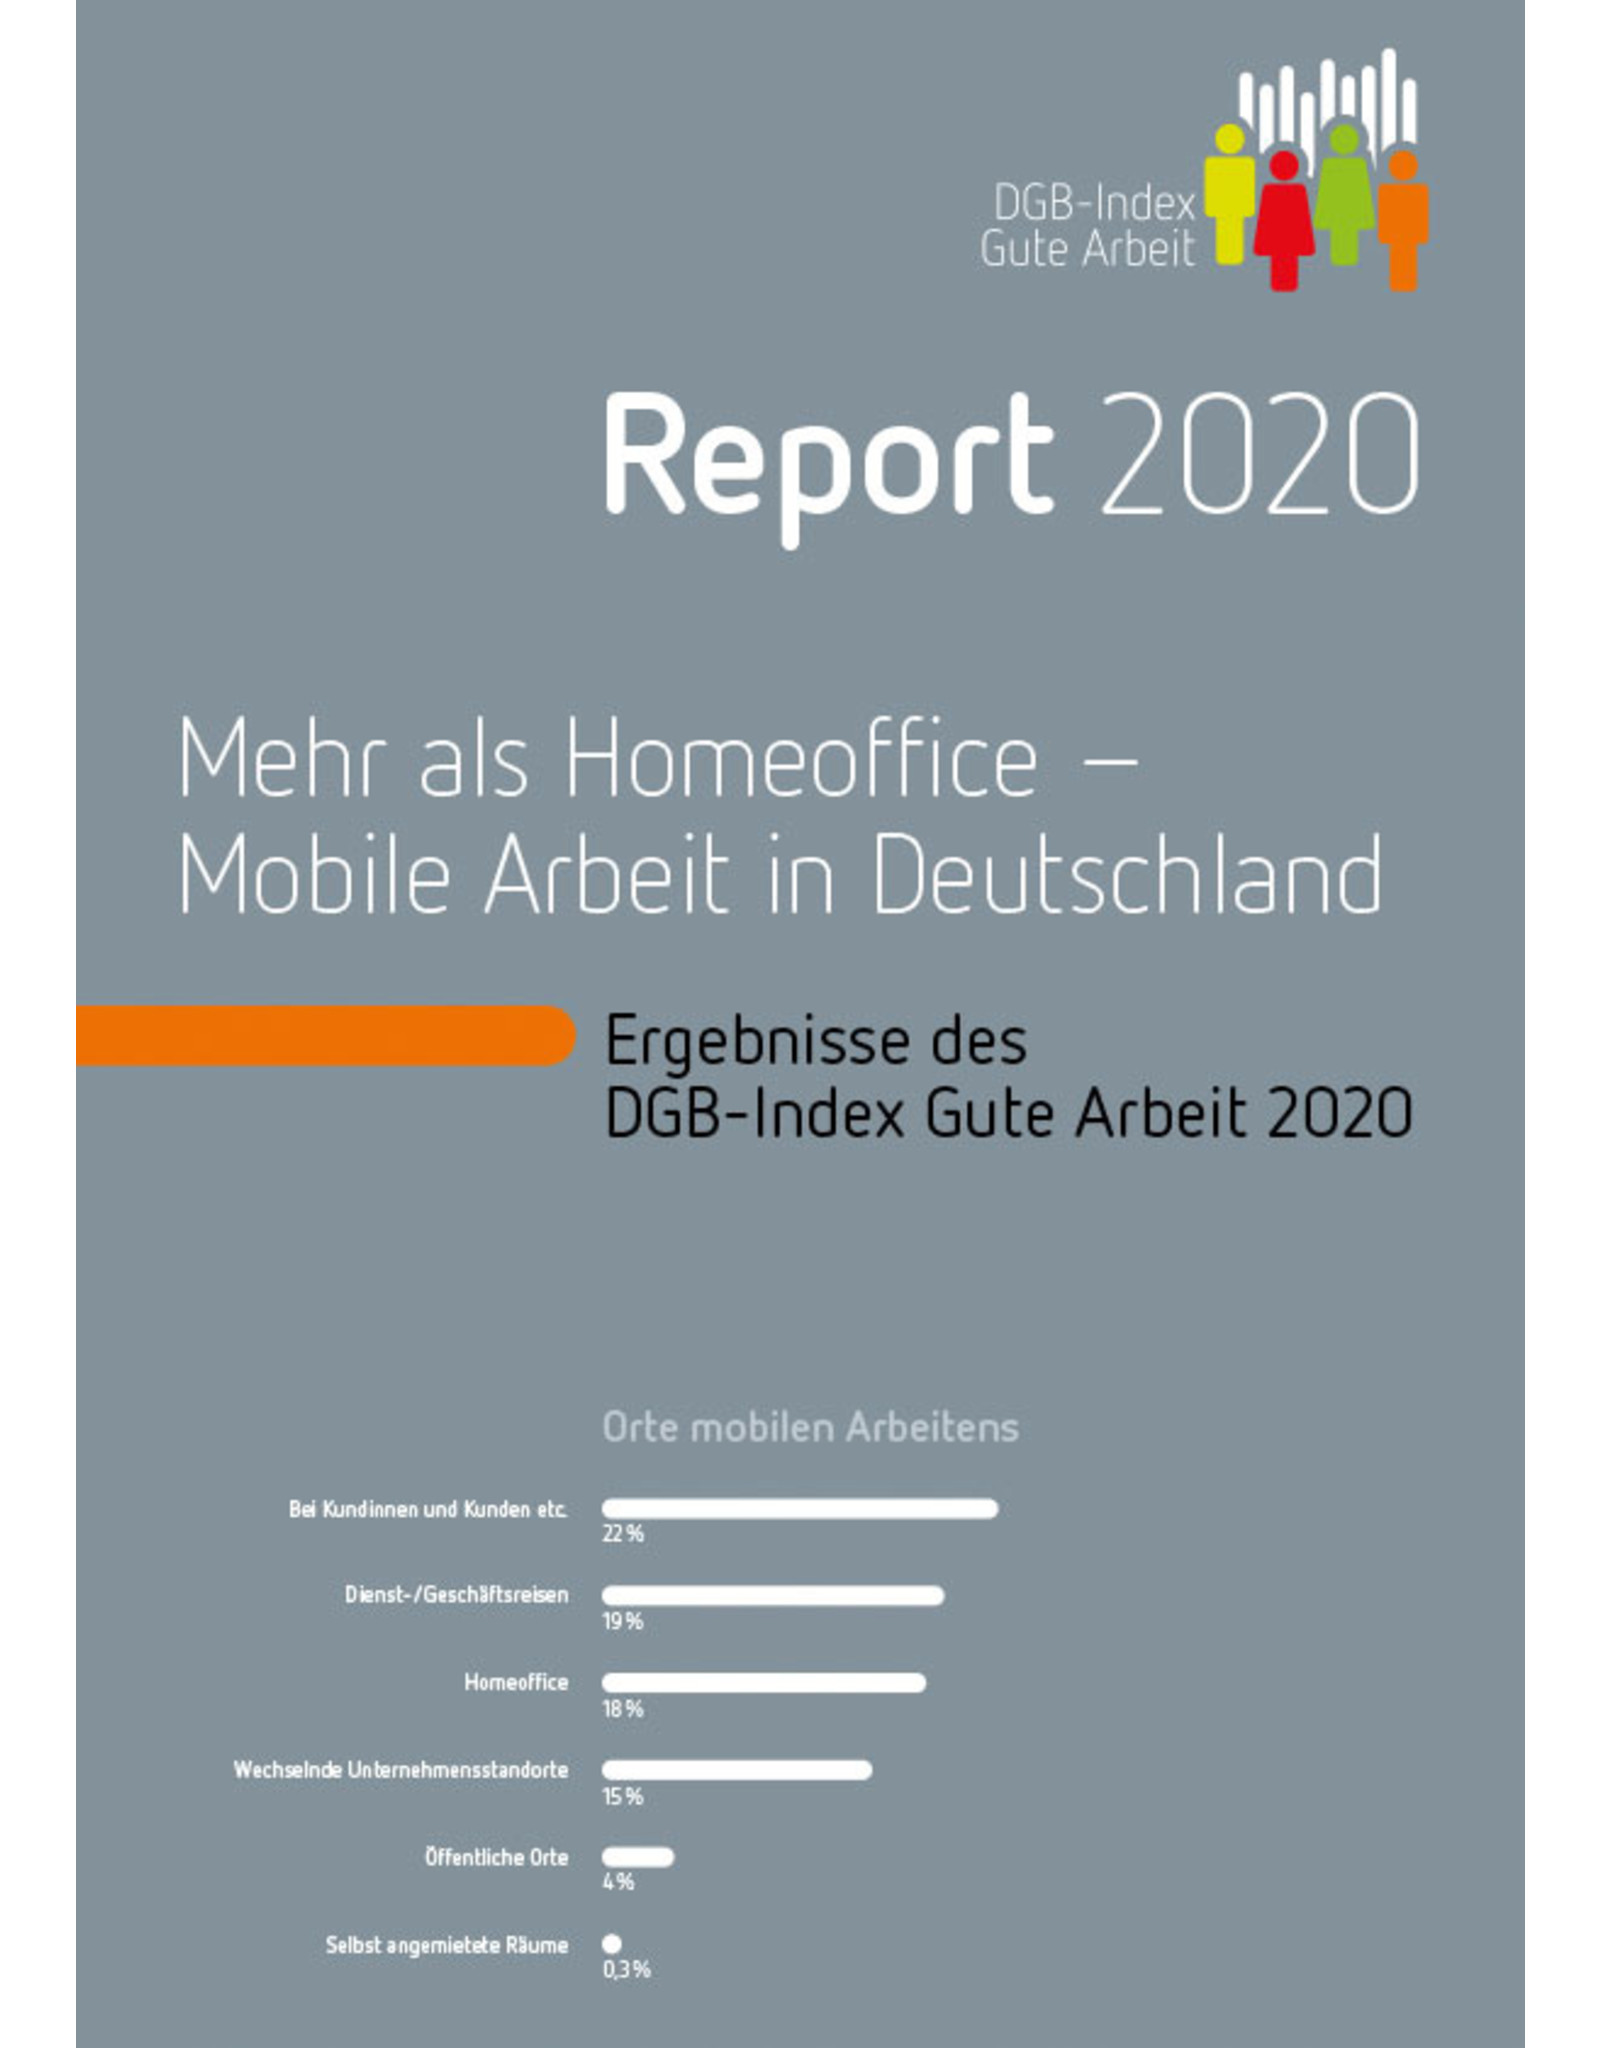 DGB-Broschüre / DGB-Index Gute Arbeit – Report 2020